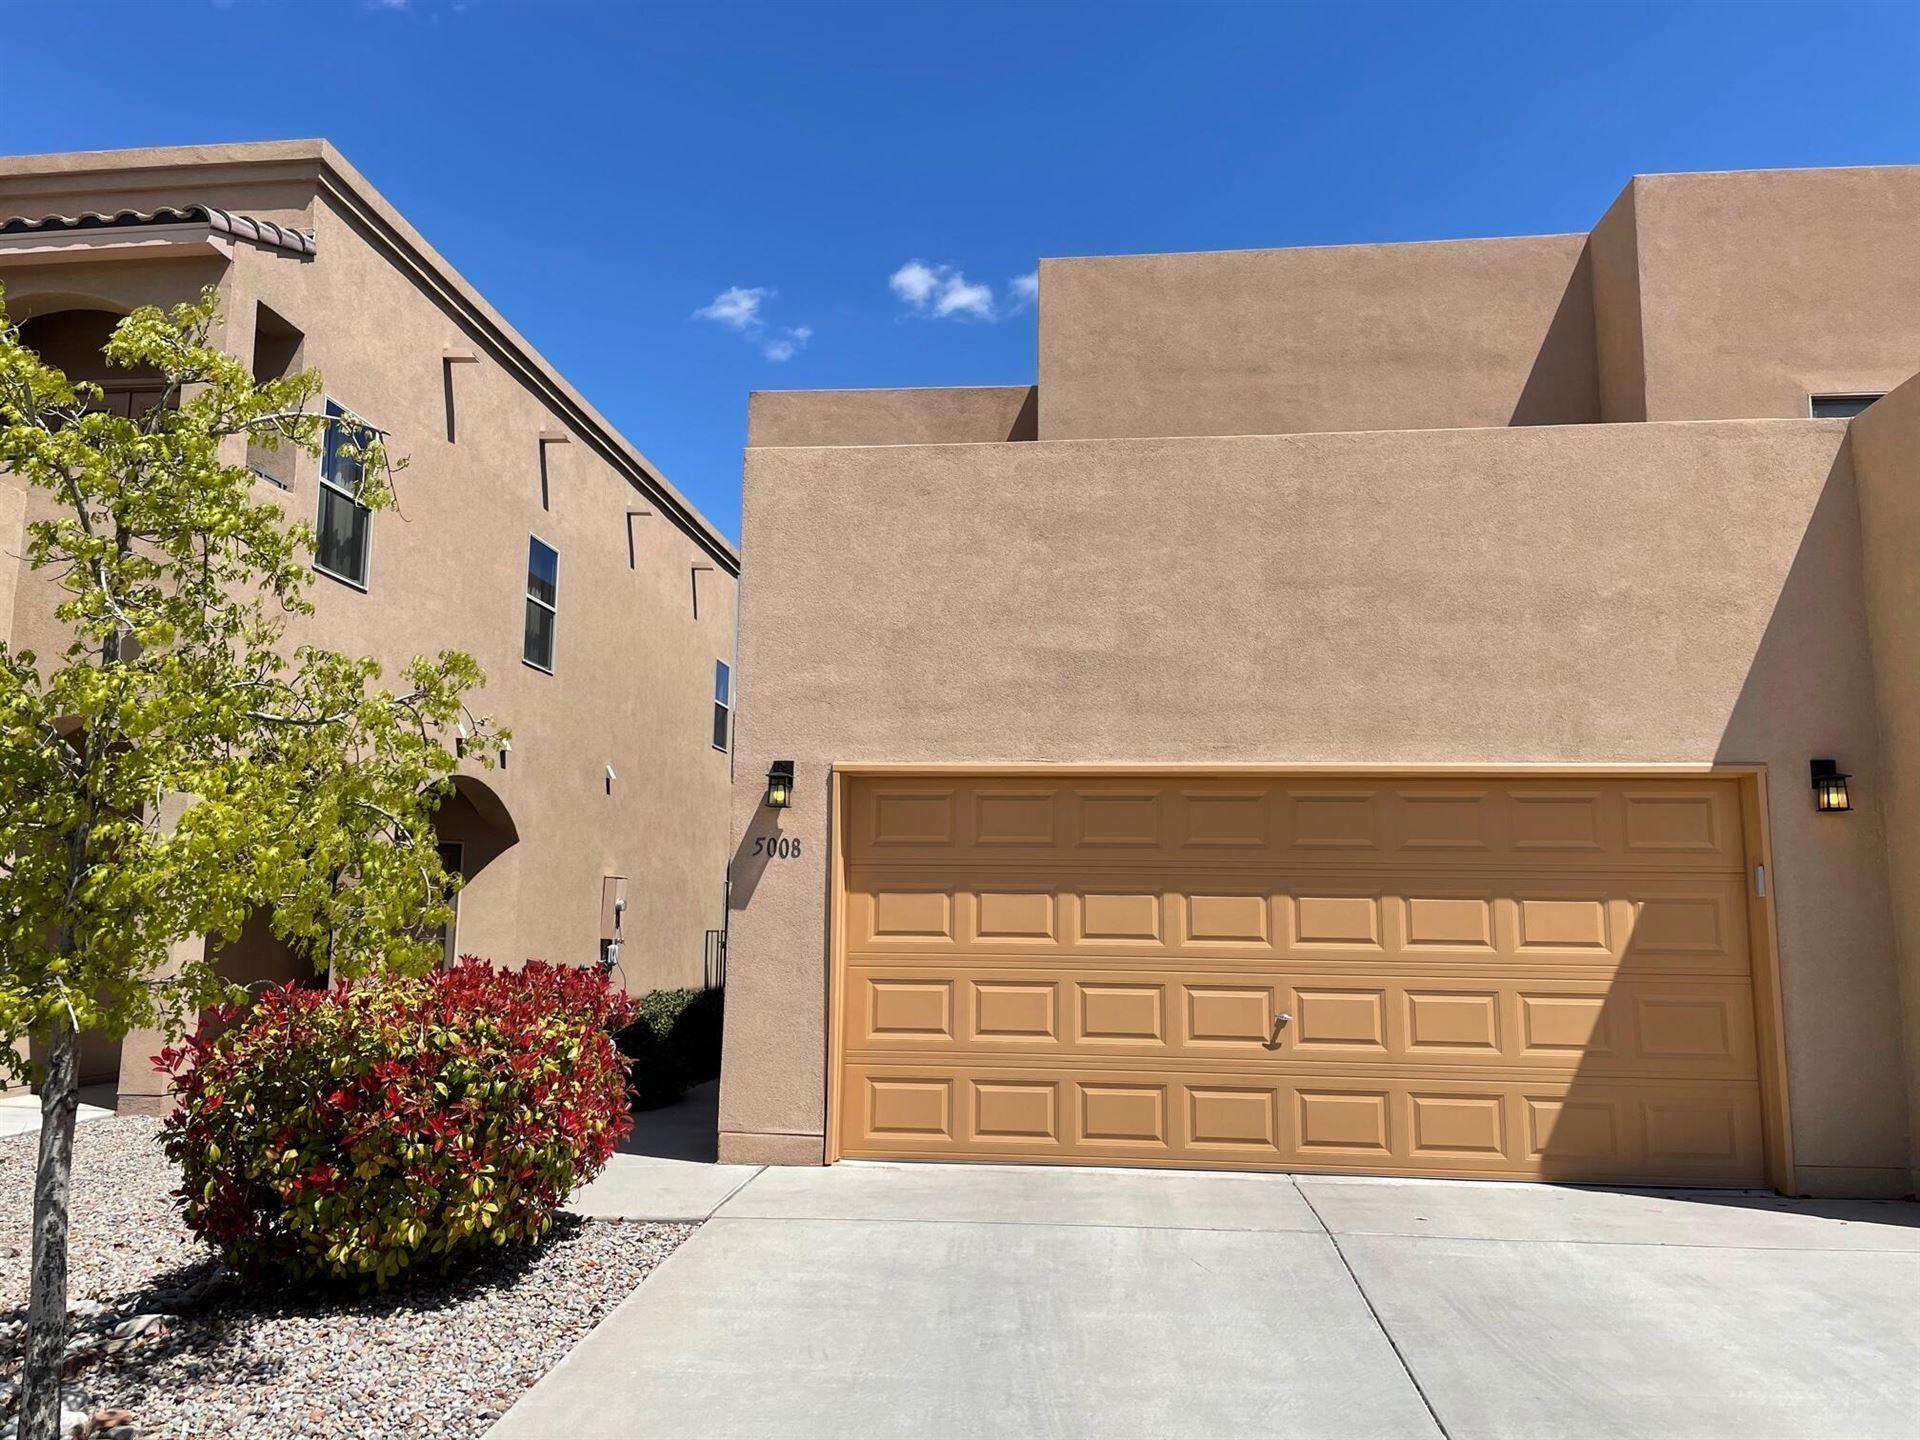 Photo of 5008 COSTA UASCA Drive NW, Albuquerque, NM 87120 (MLS # 989956)